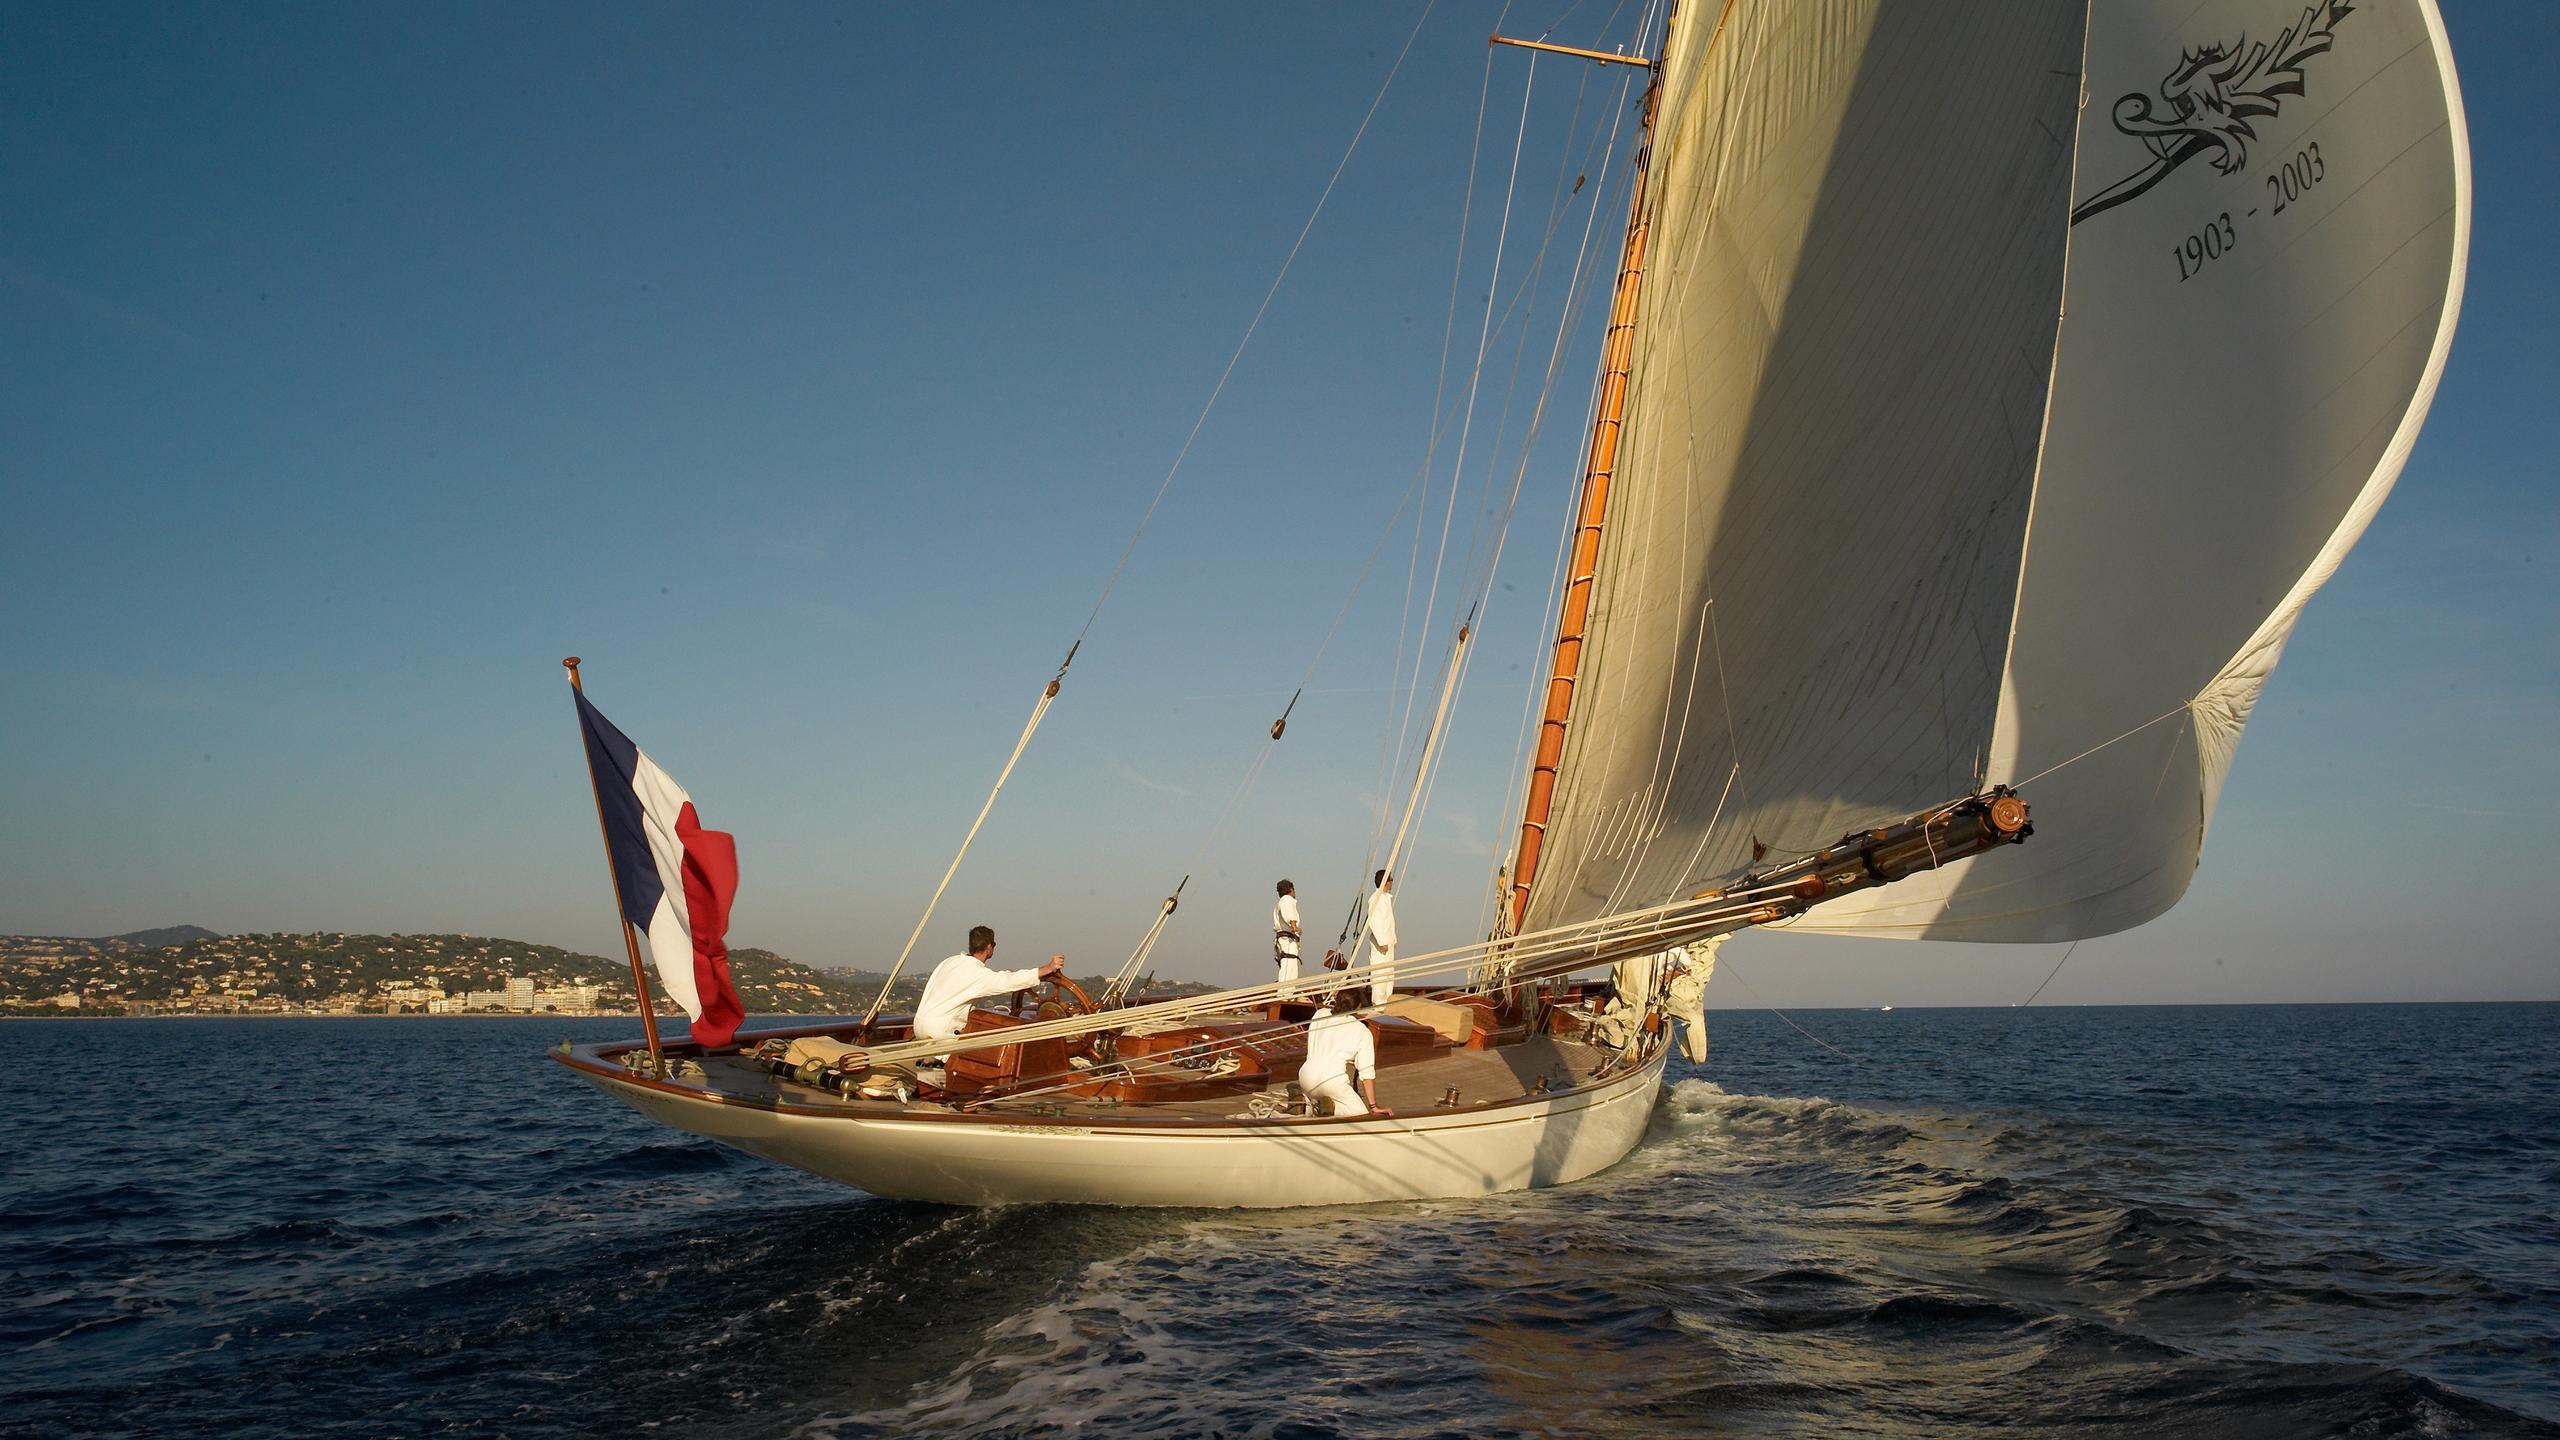 moonbeam-of-fife-iii-yacht-for-sale-profile